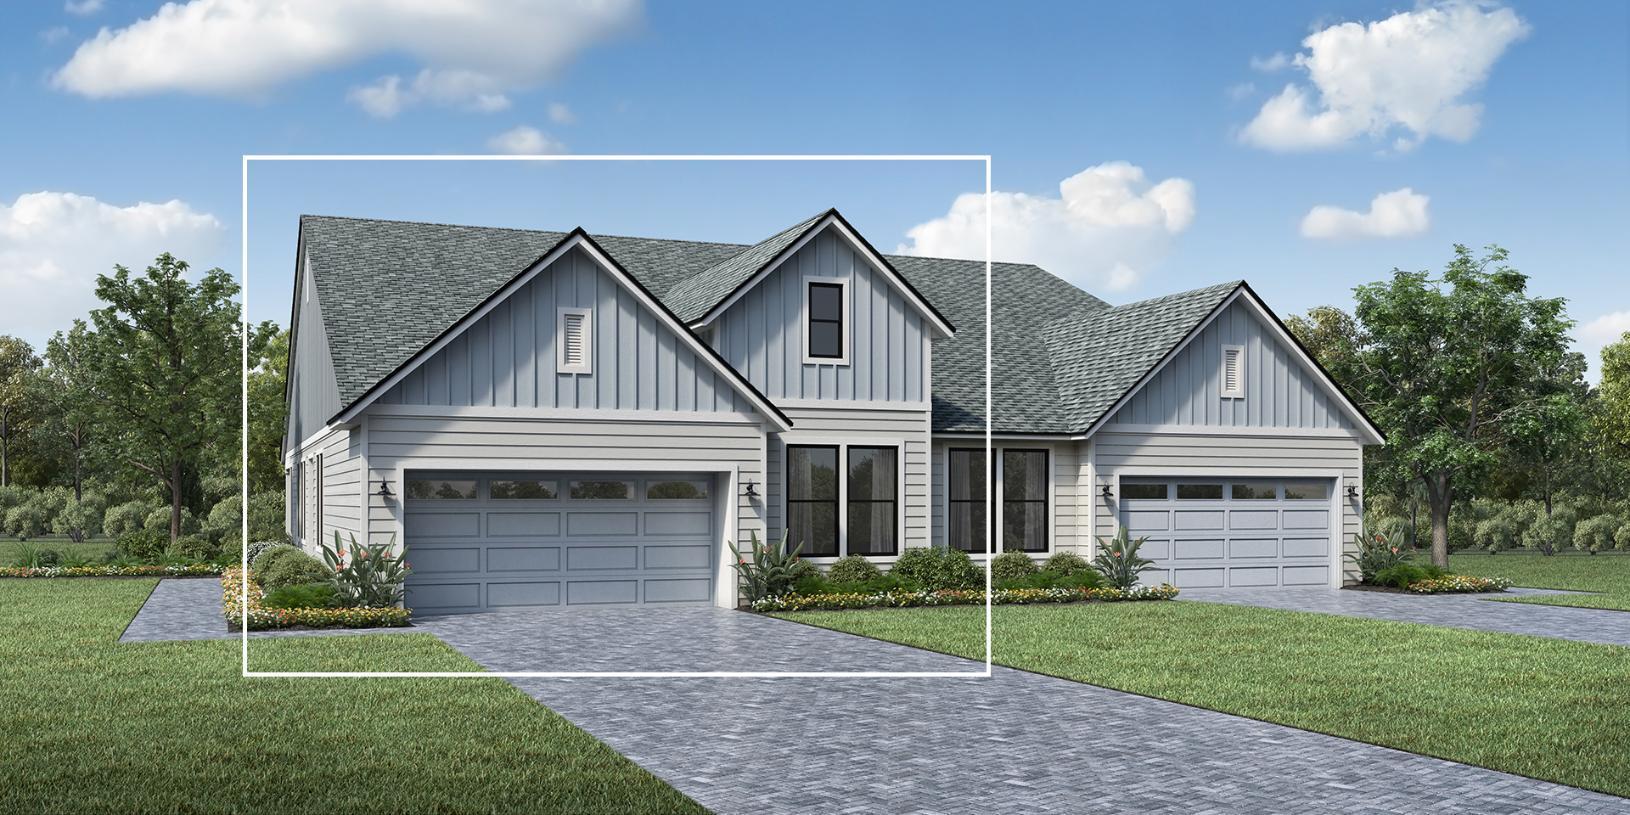 Elevation Image:Farmhouse